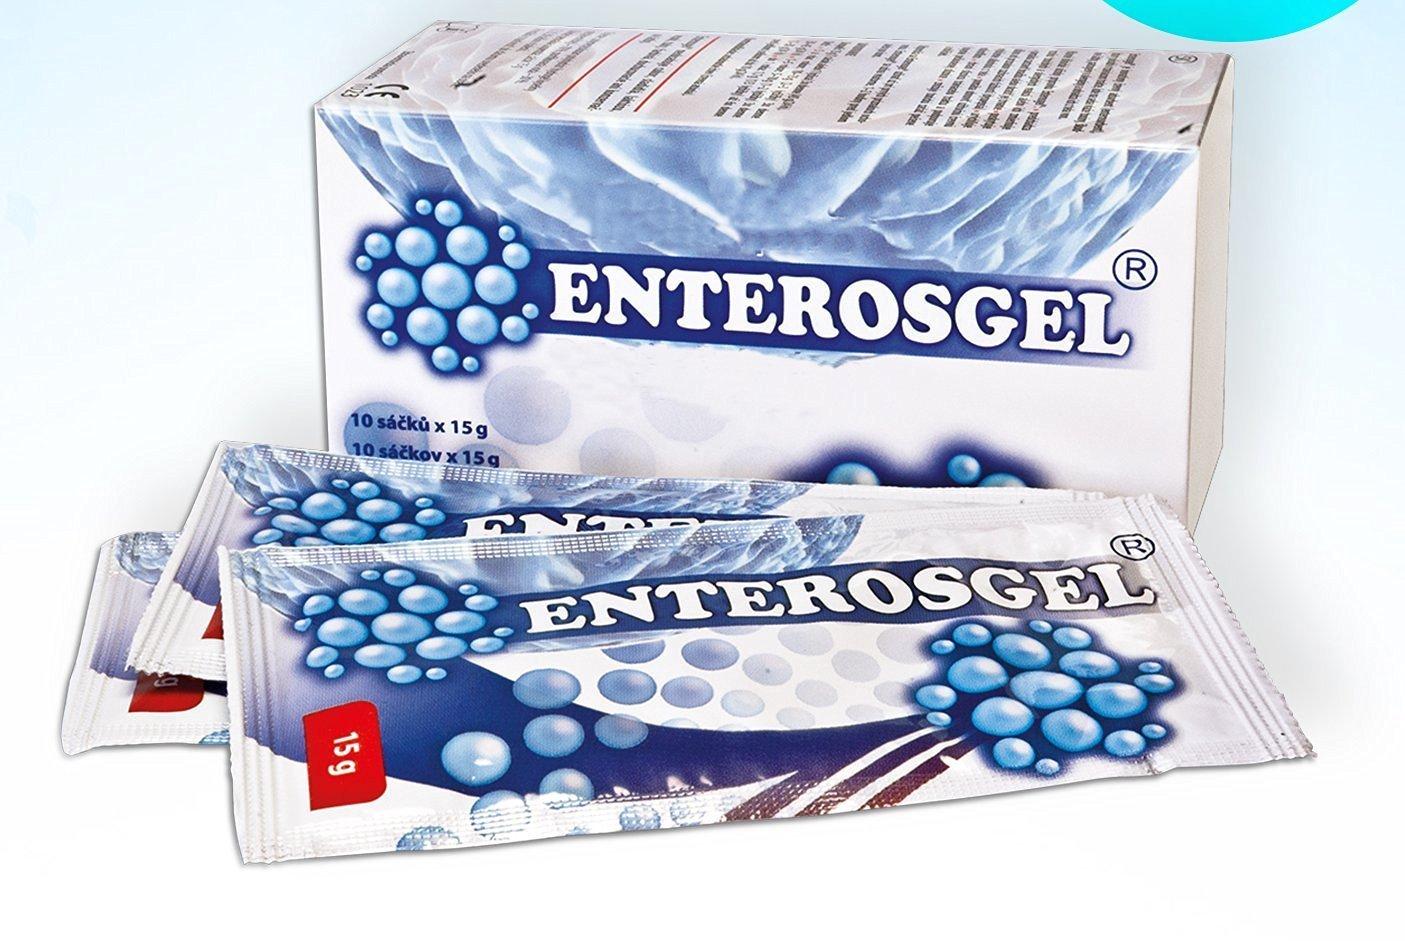 Enterosgel detoxifying preparation: instructions for use 69